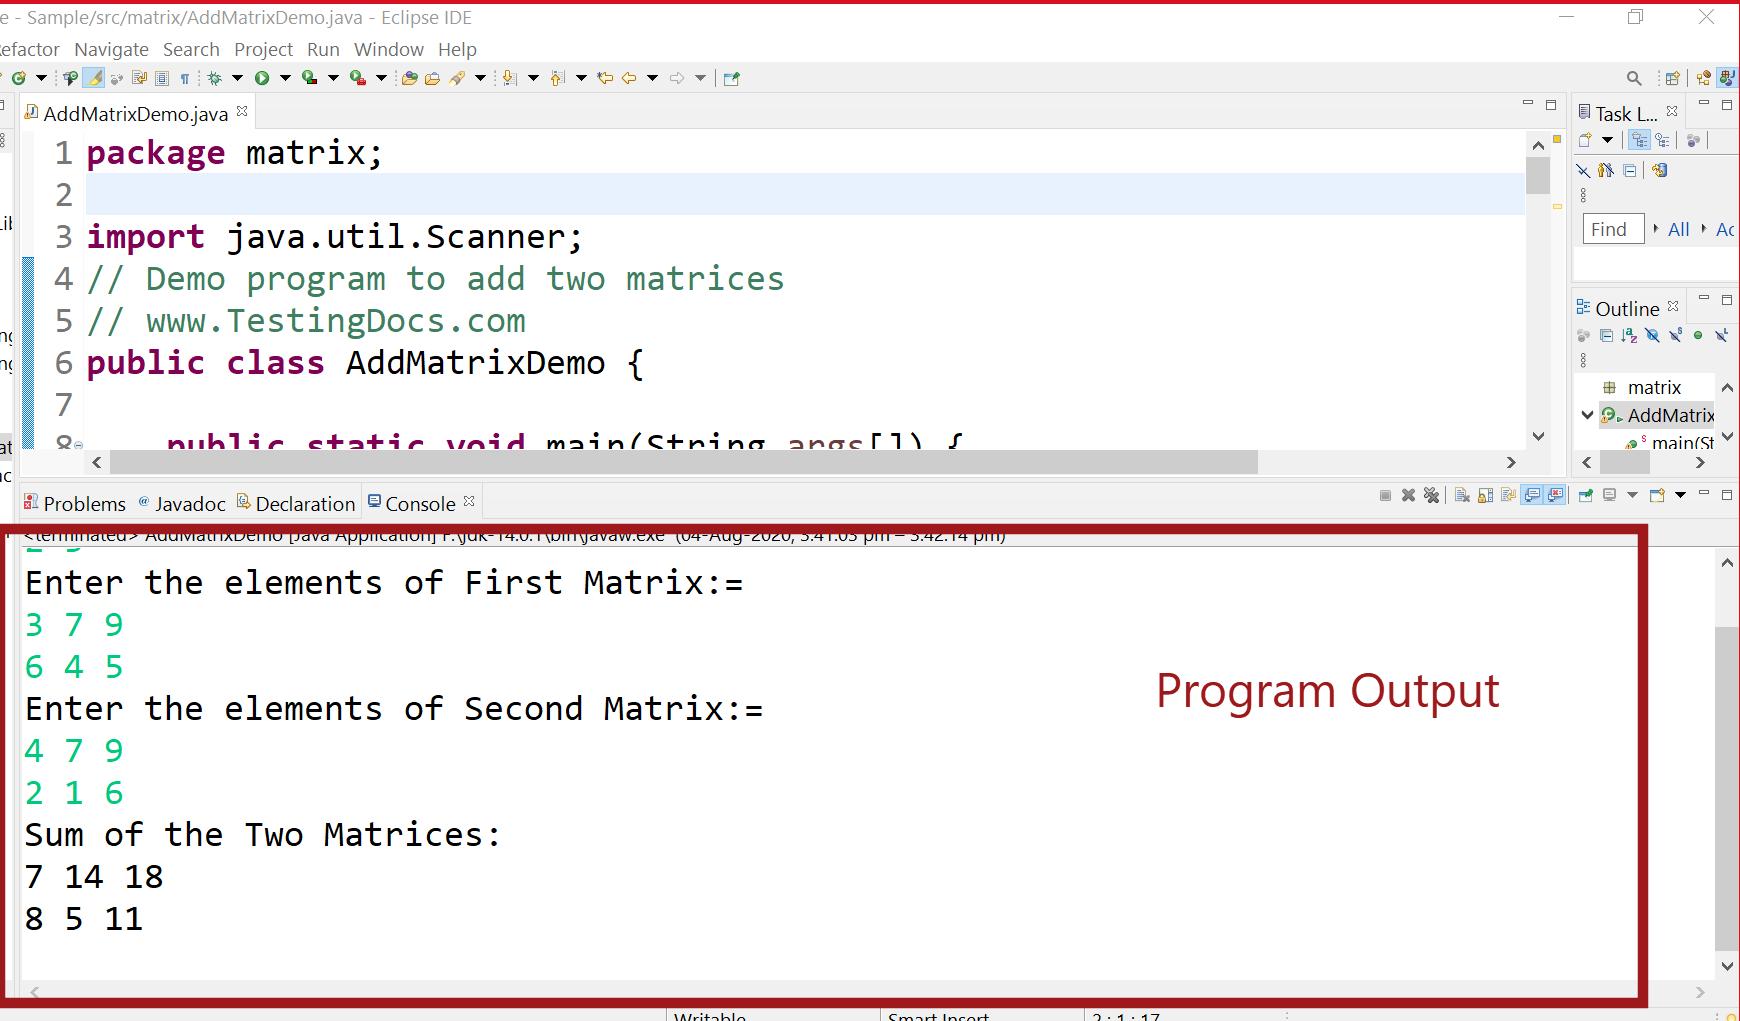 Adding two matrix Java program